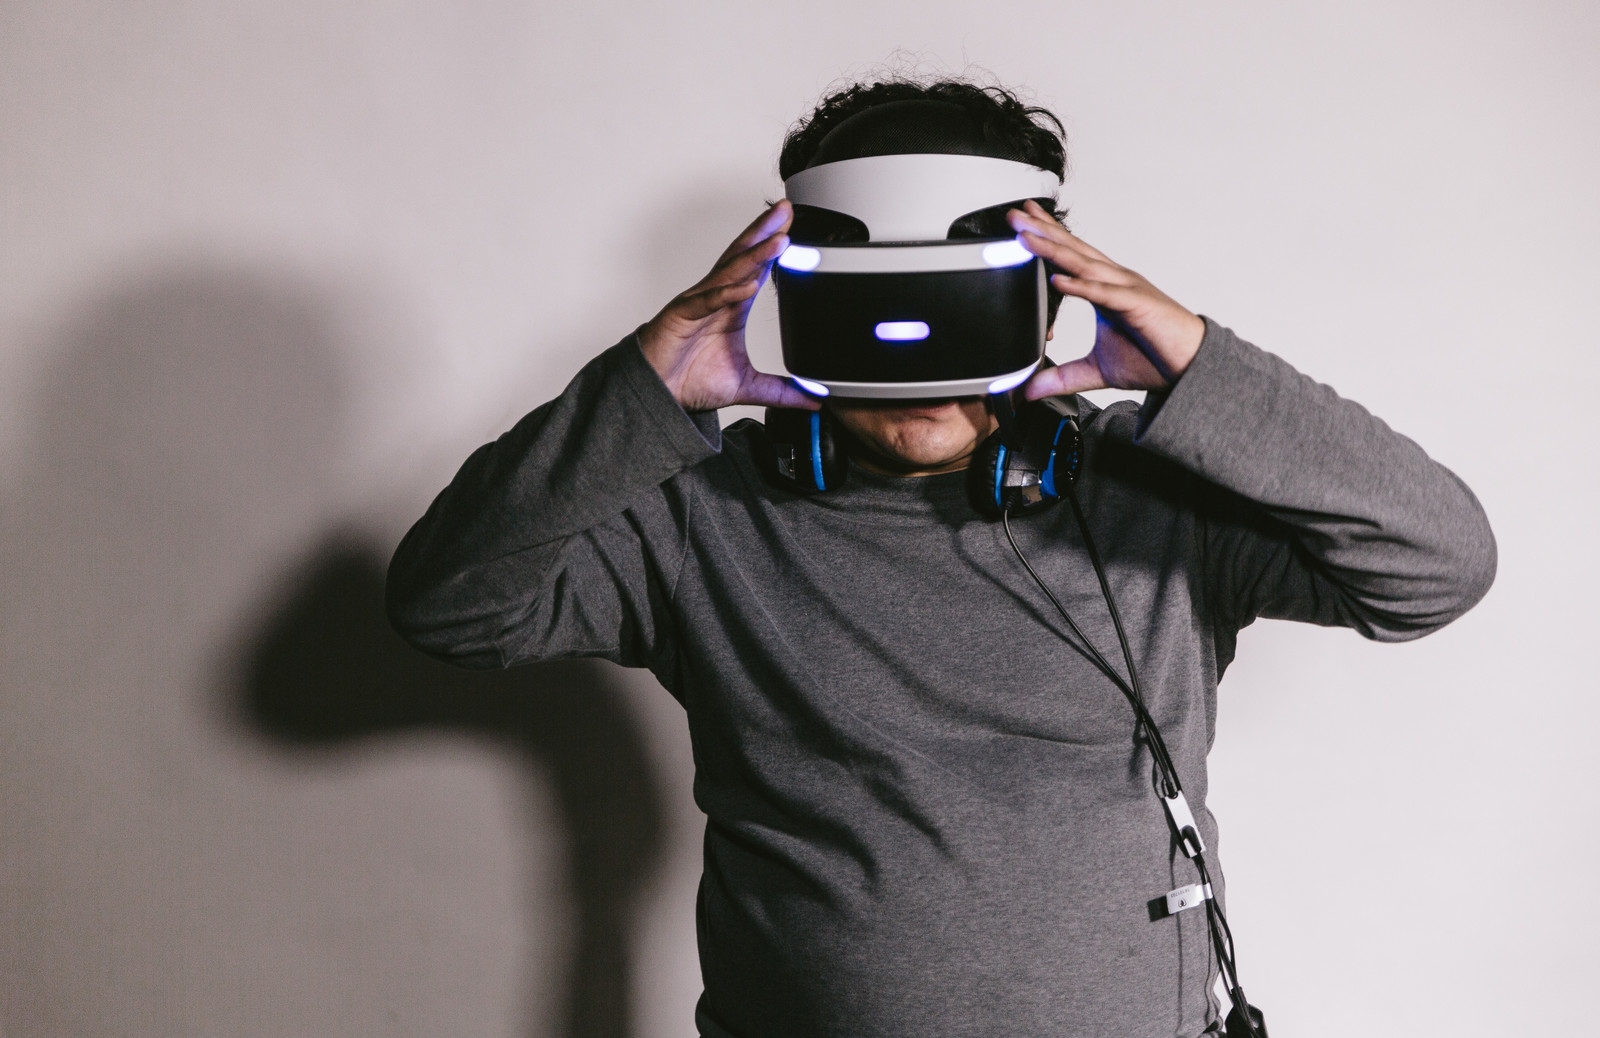 「PlayStation VR」を装着している様子